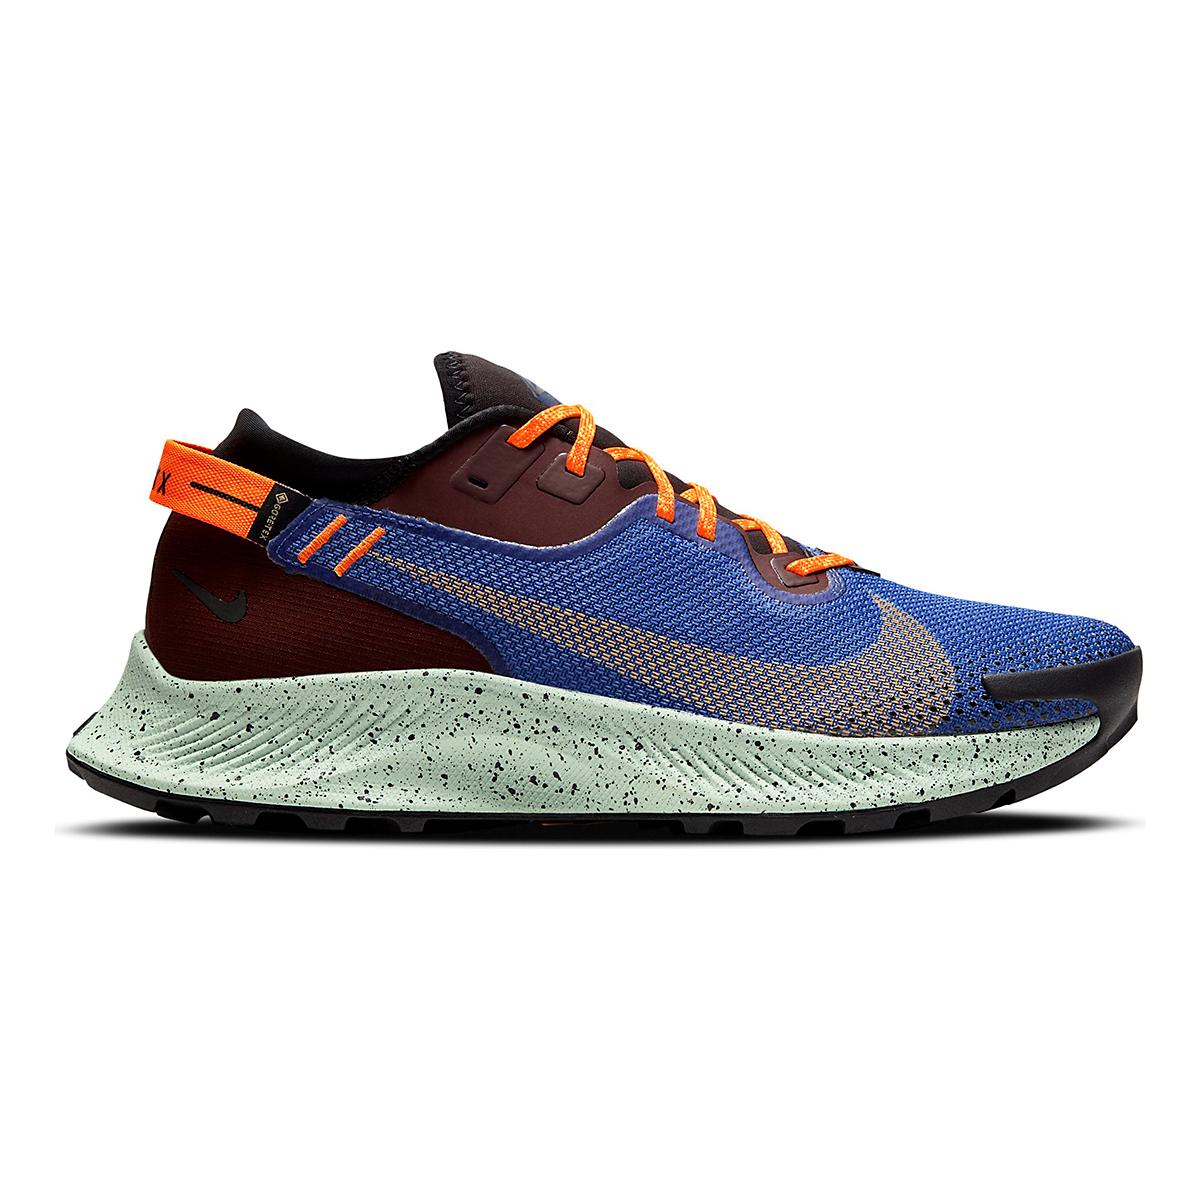 Men's Nike Pegasus Trail 2 Gore-Tex Running Shoe - Color: Mystic Dates/Laser Orange/ Astronomy Blue - Size: 6 - Width: Regular, Mystic Dates/Laser Orange/ Astronomy Blue, large, image 1